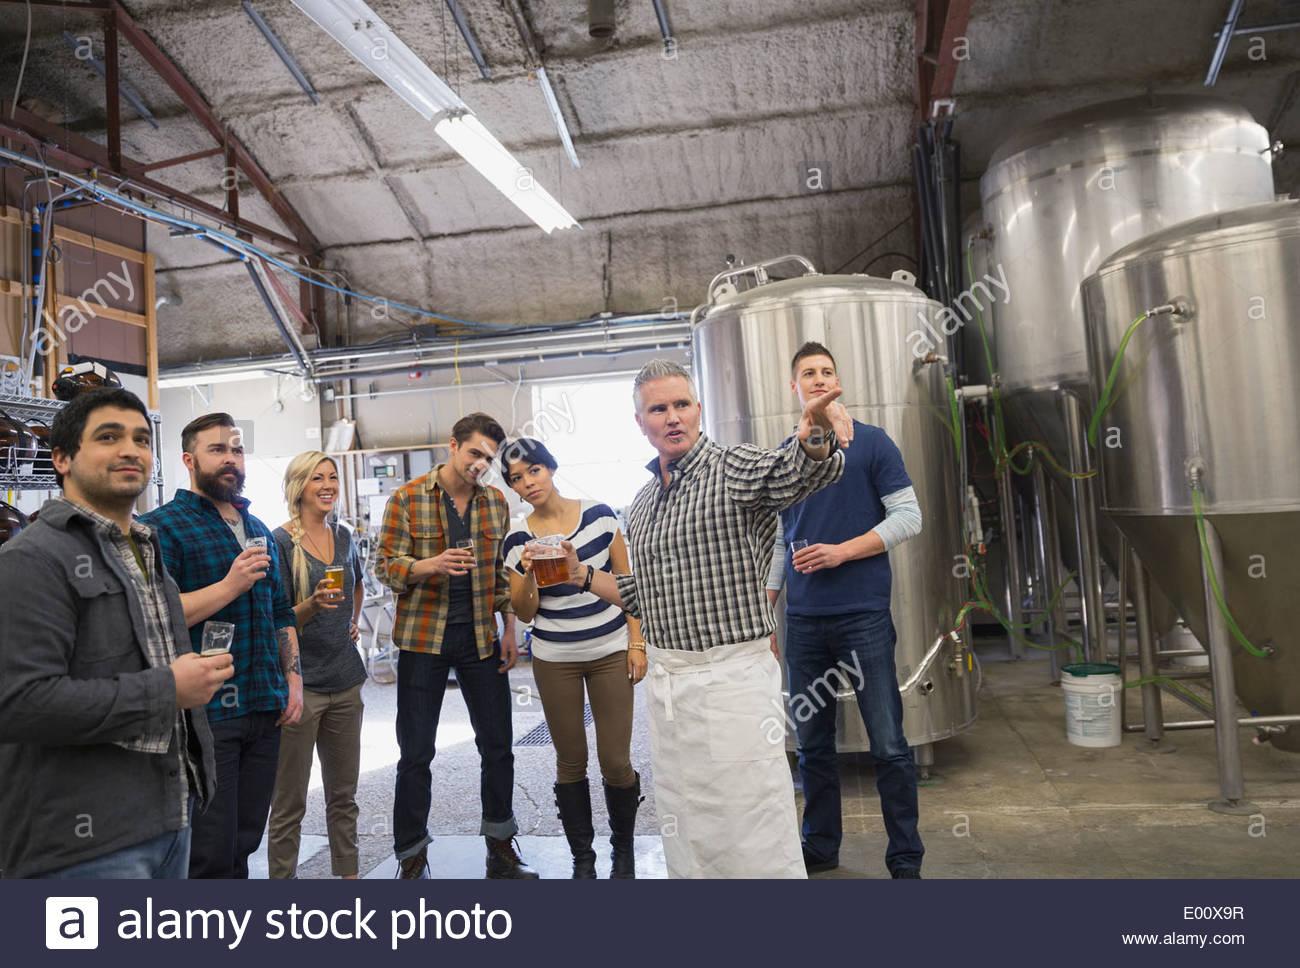 Man guiding tour at brewery - Stock Image